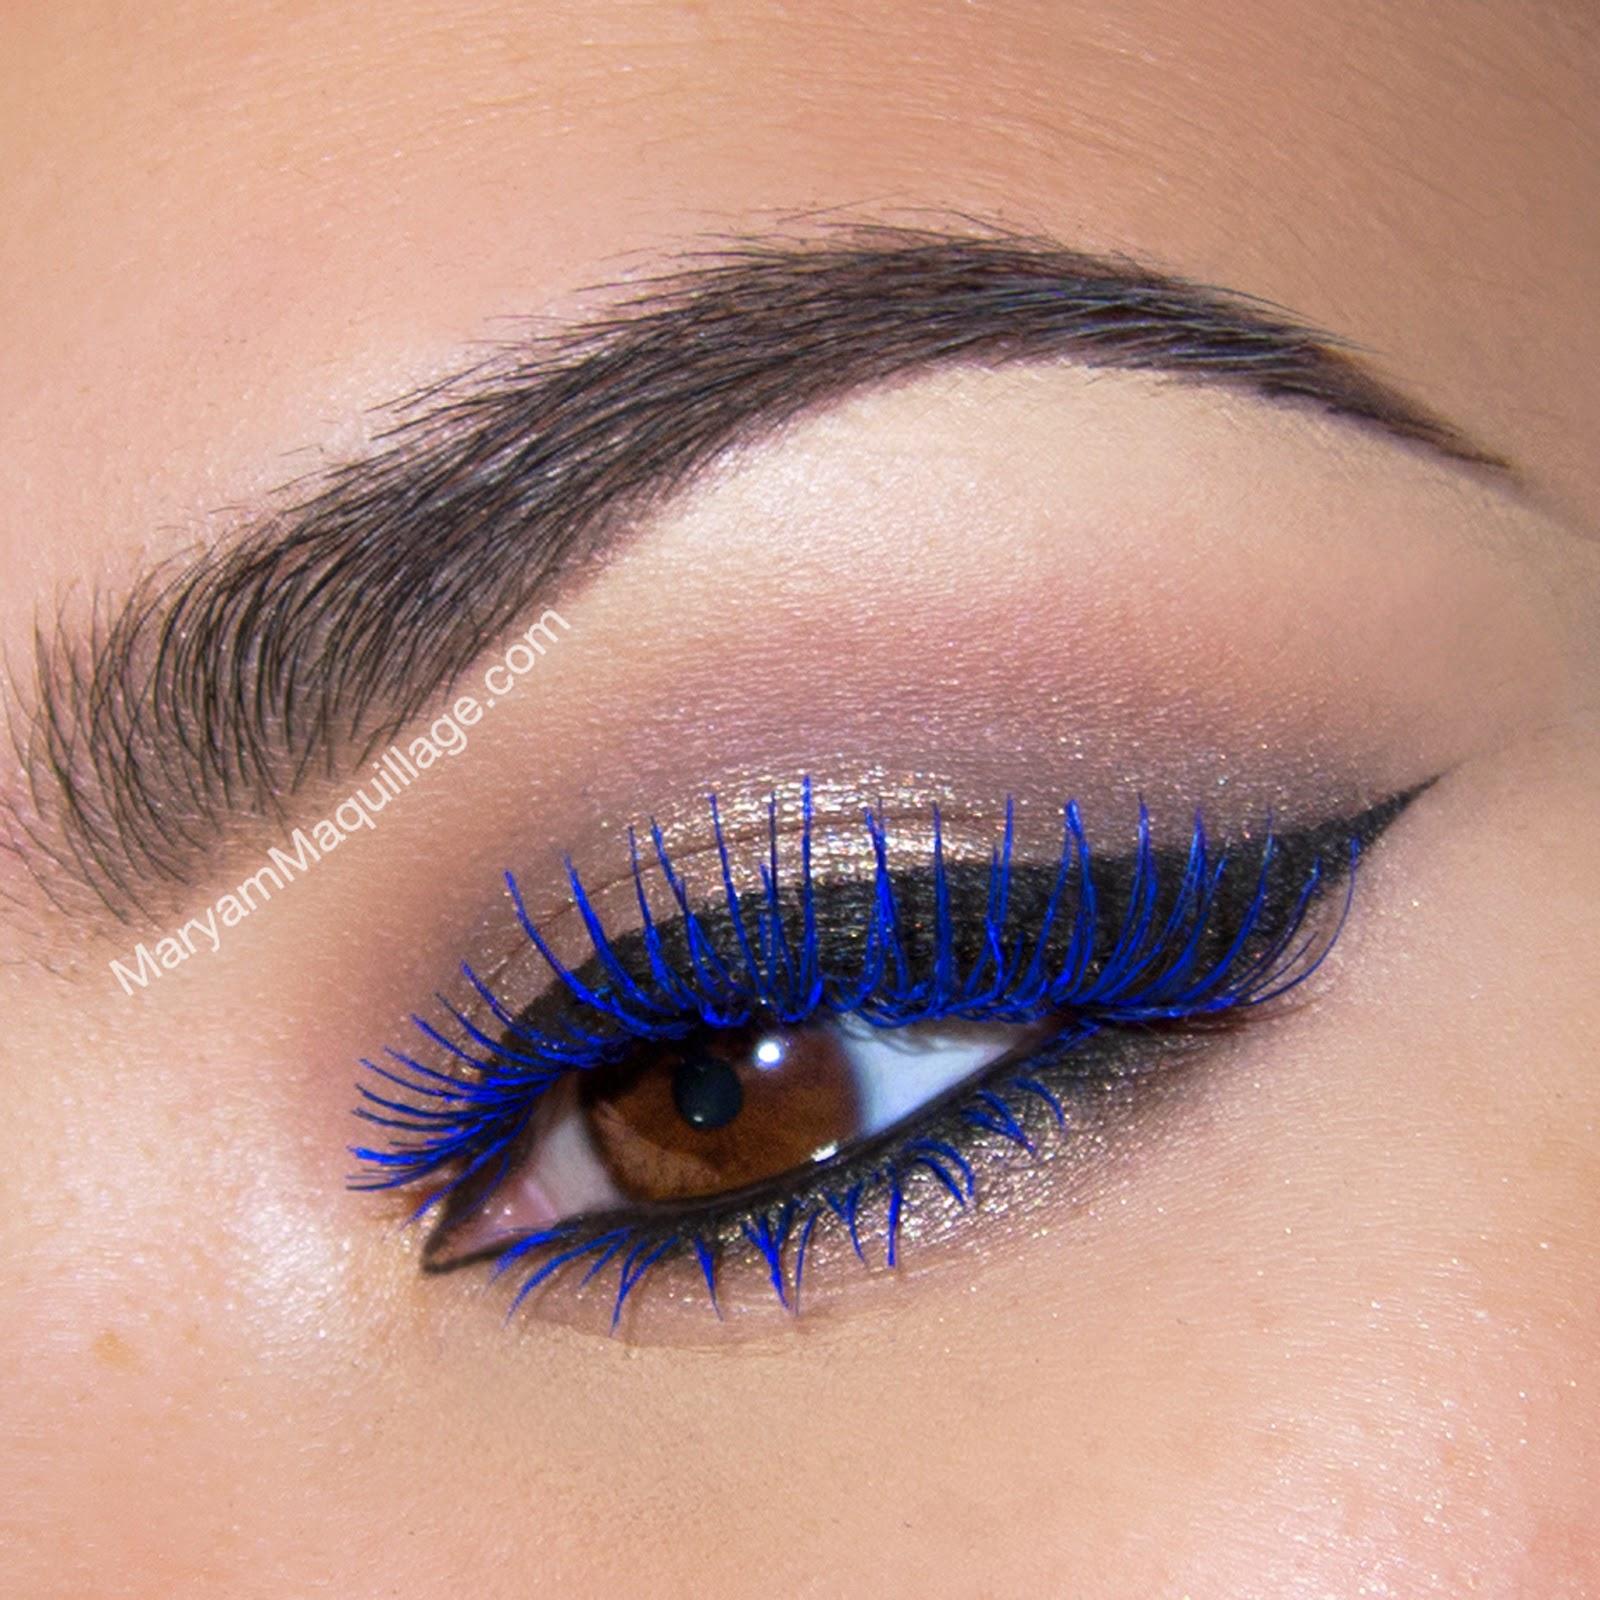 Maryam Maquillage: Summer Makeup: Blue Lashes